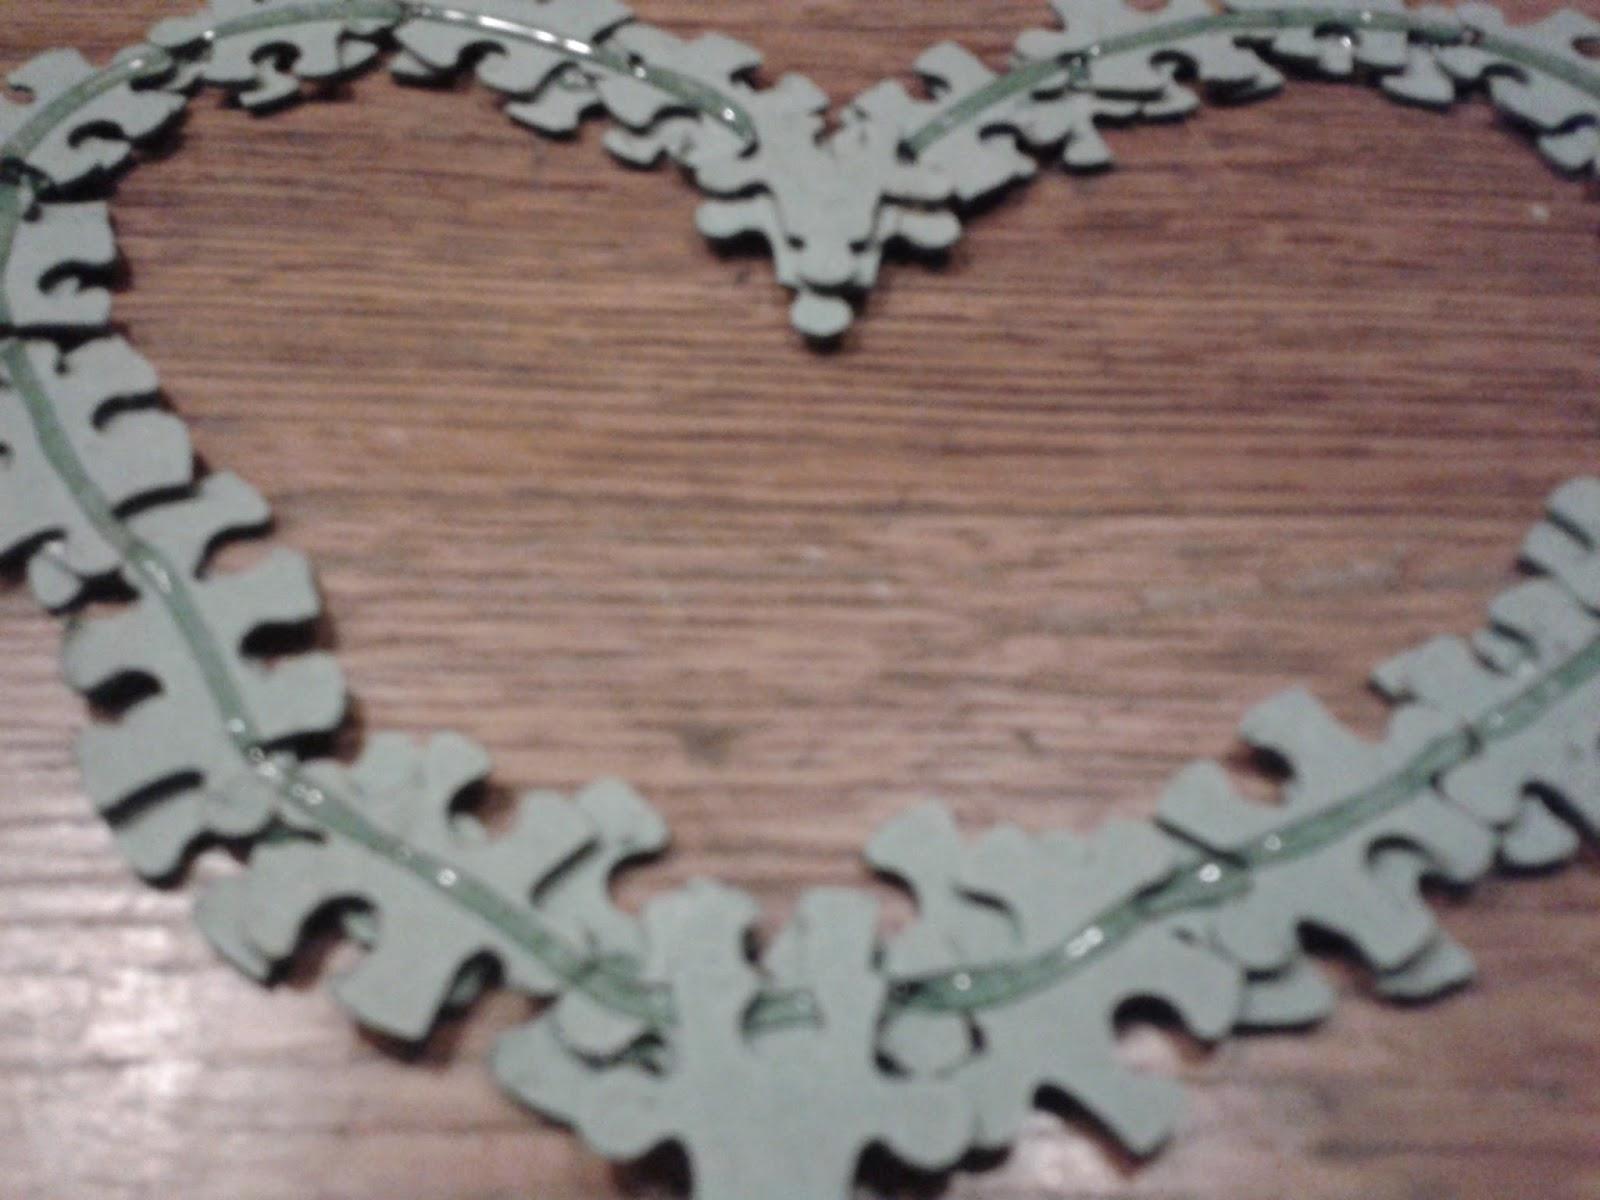 2014 03 18+20.21.33 - Hartje van puzzels